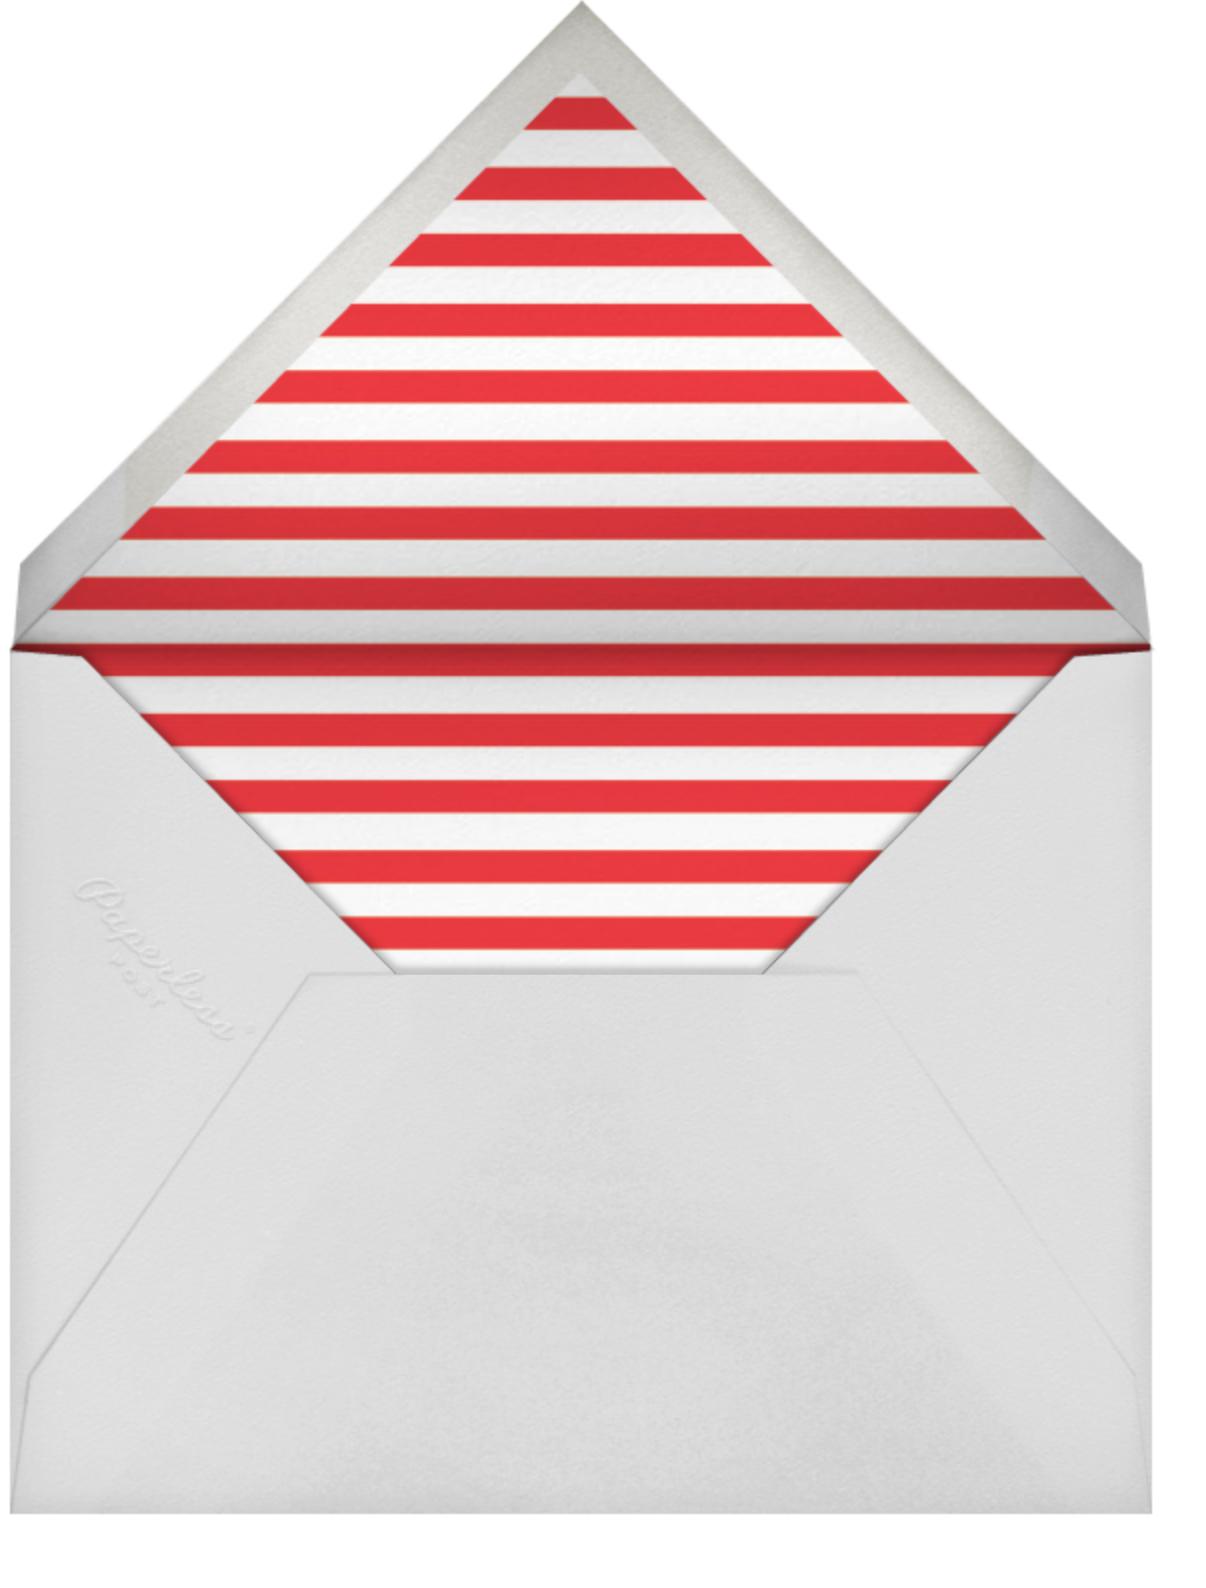 Joyful Stripes (Multi-Photo) - Paperless Post - Envelope